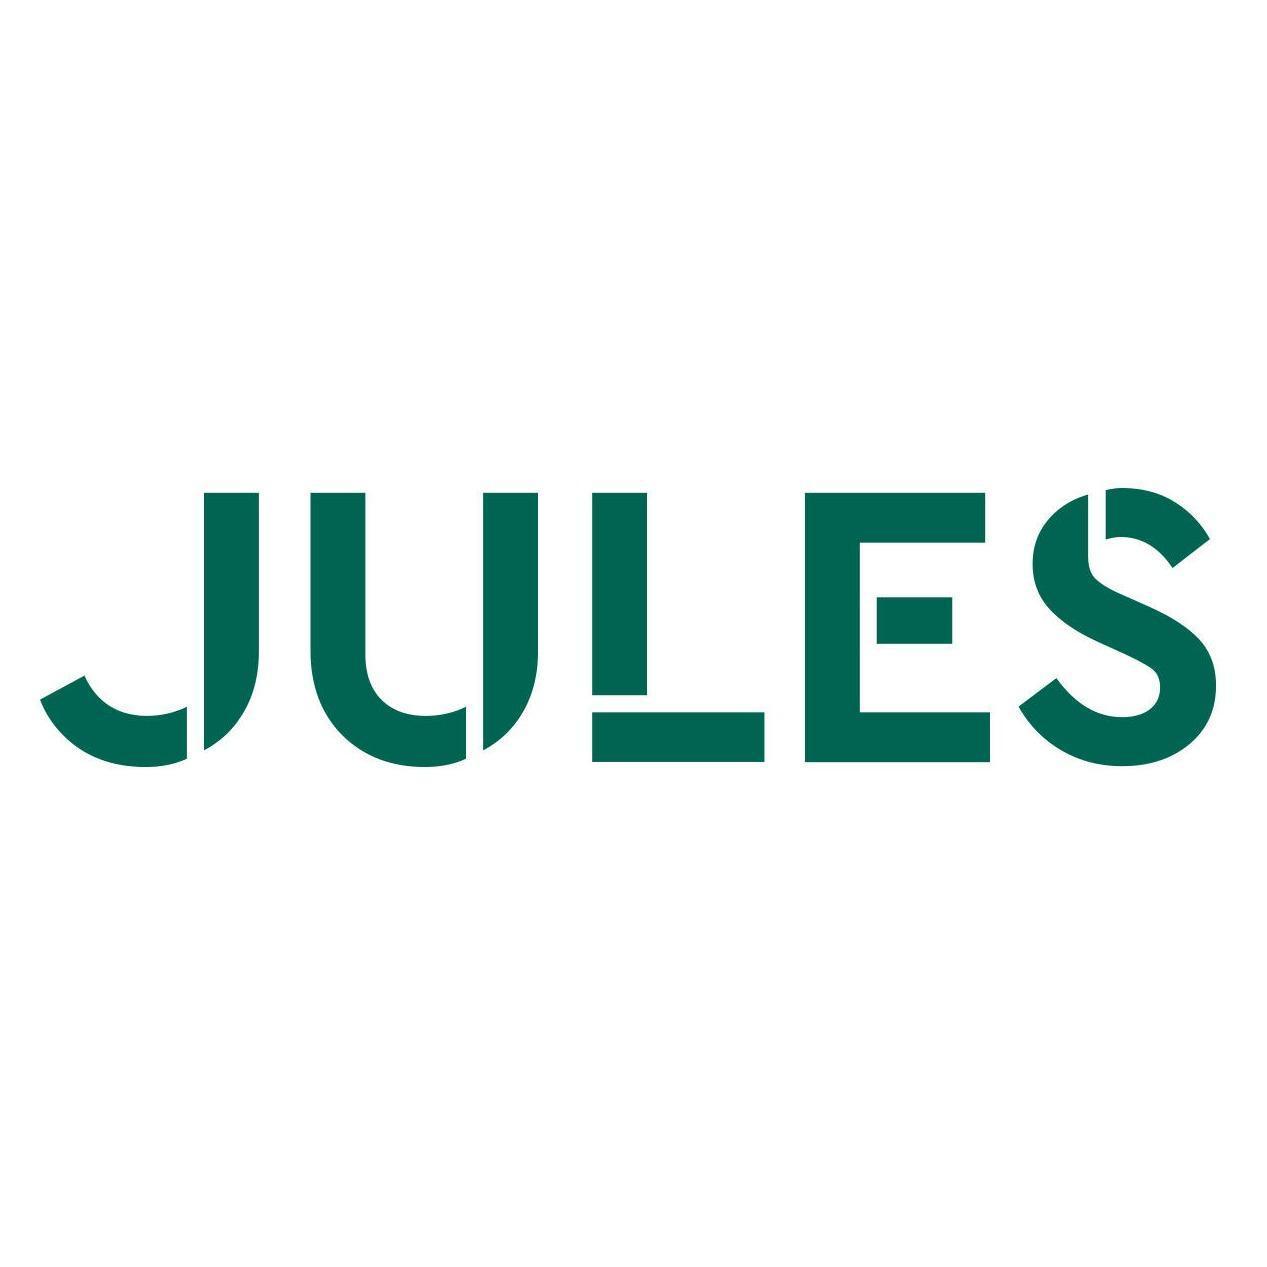 Jules Poitiers